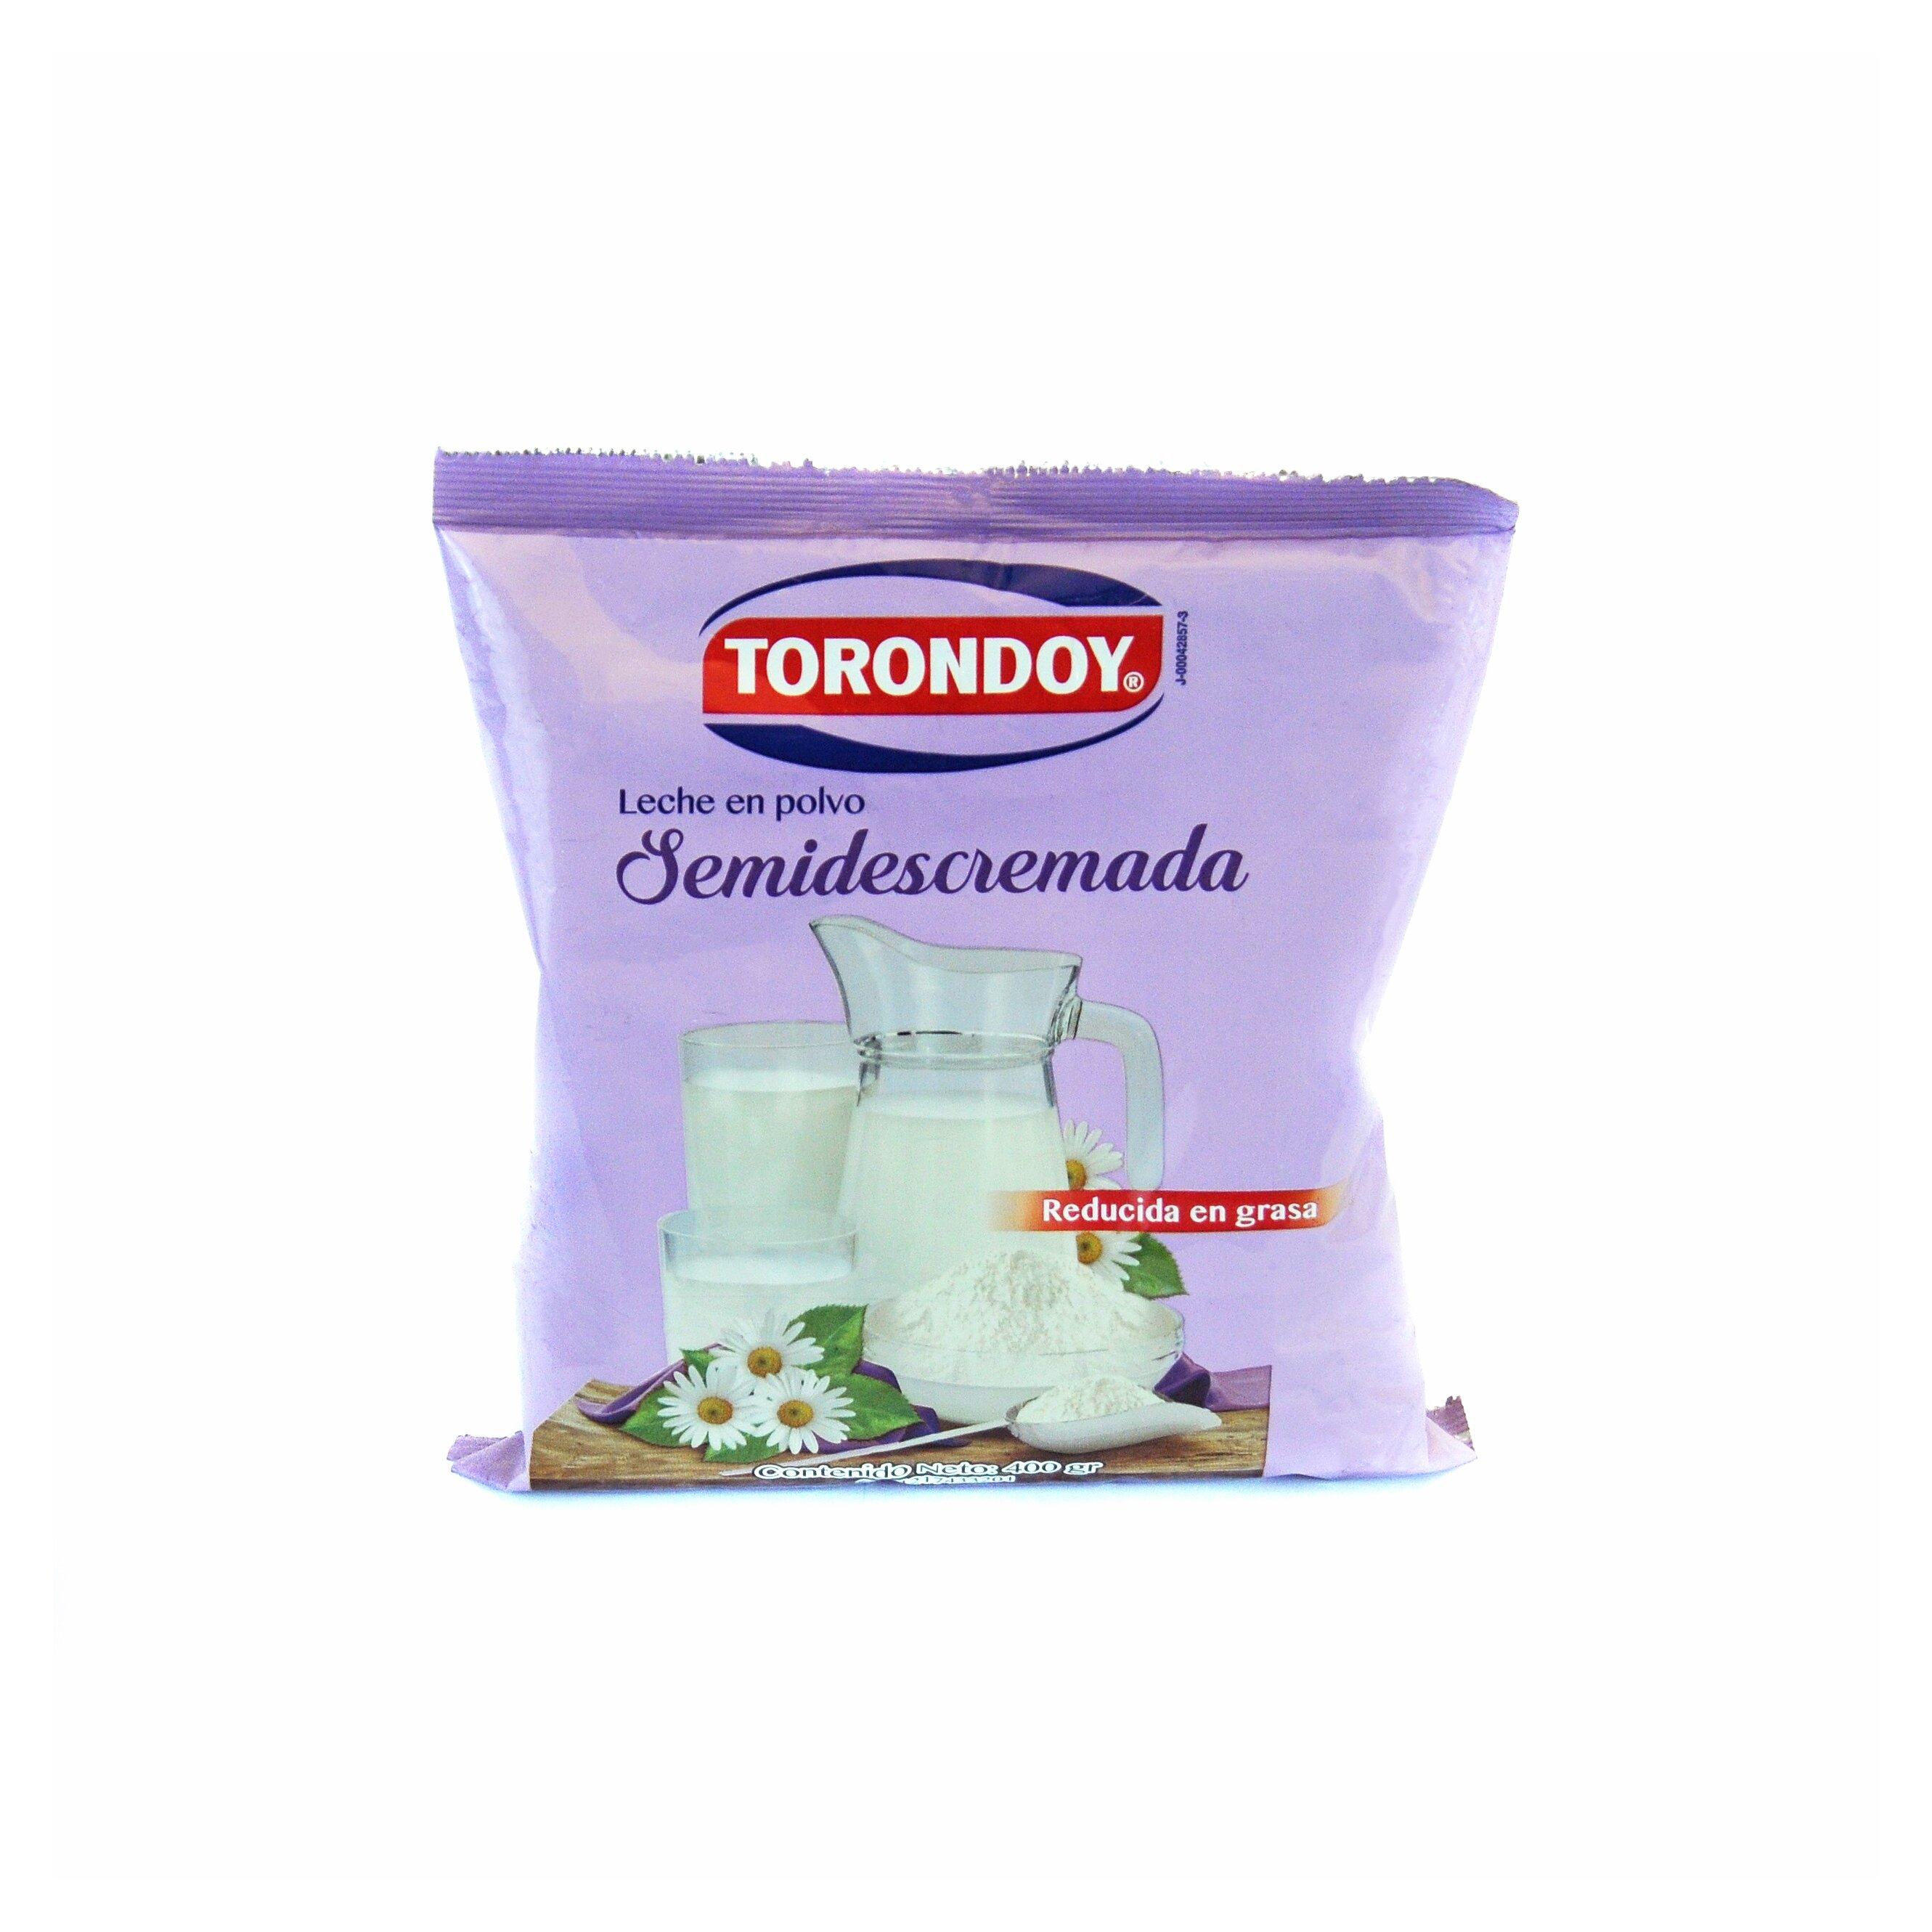 LECHE TORONDOY SEMIDESCREMADA BOLSA 400 GR